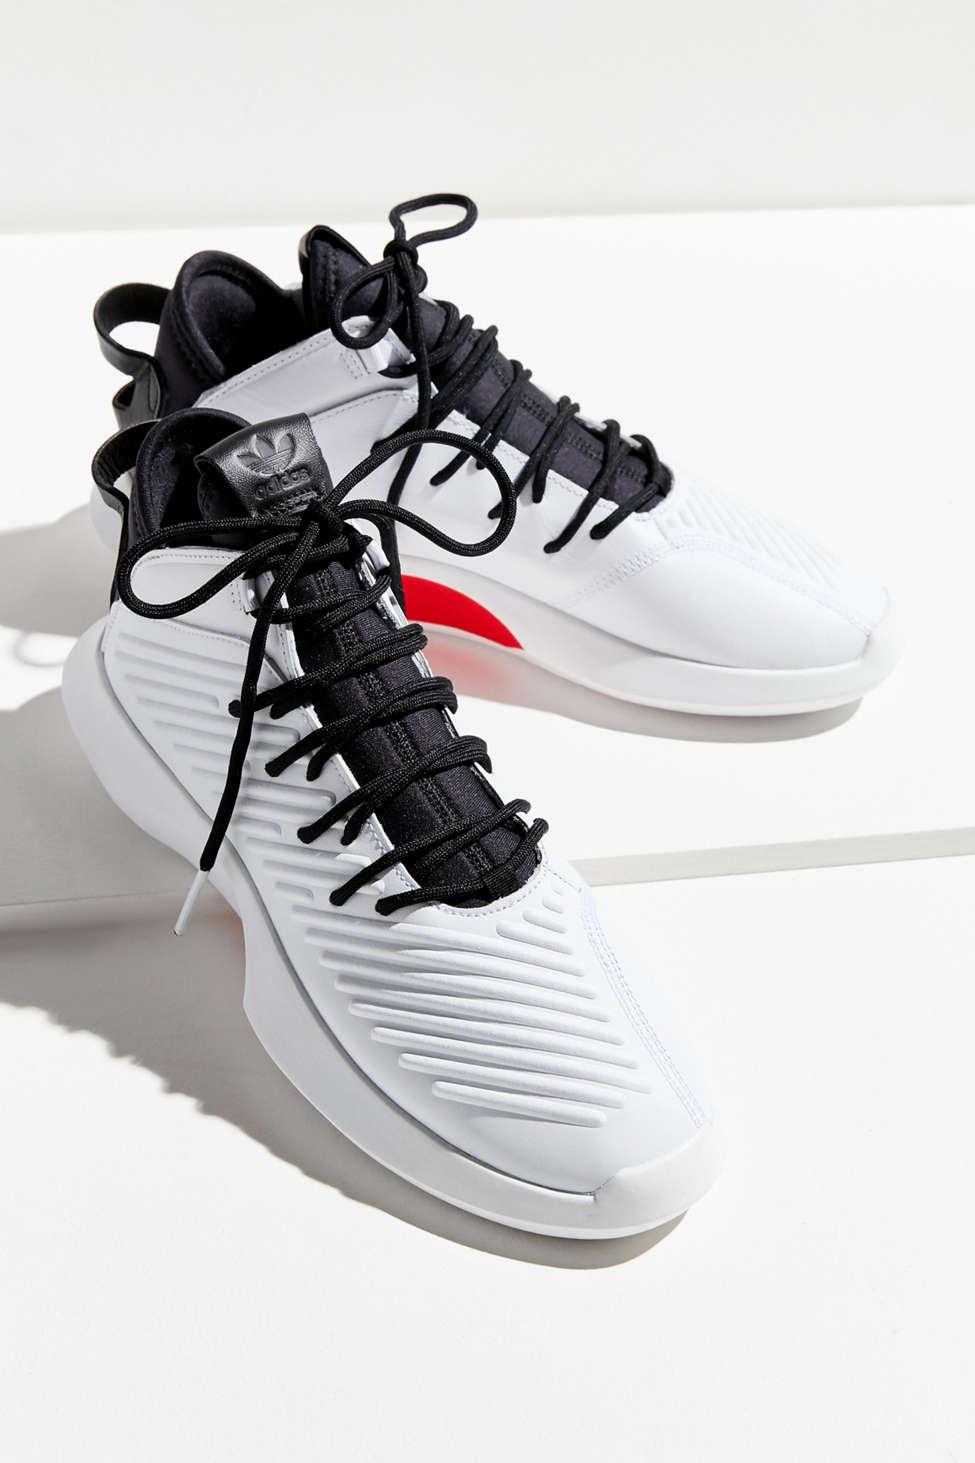 pazzo 1 avanzata urban outfitters di scarpe da ginnastica adidas